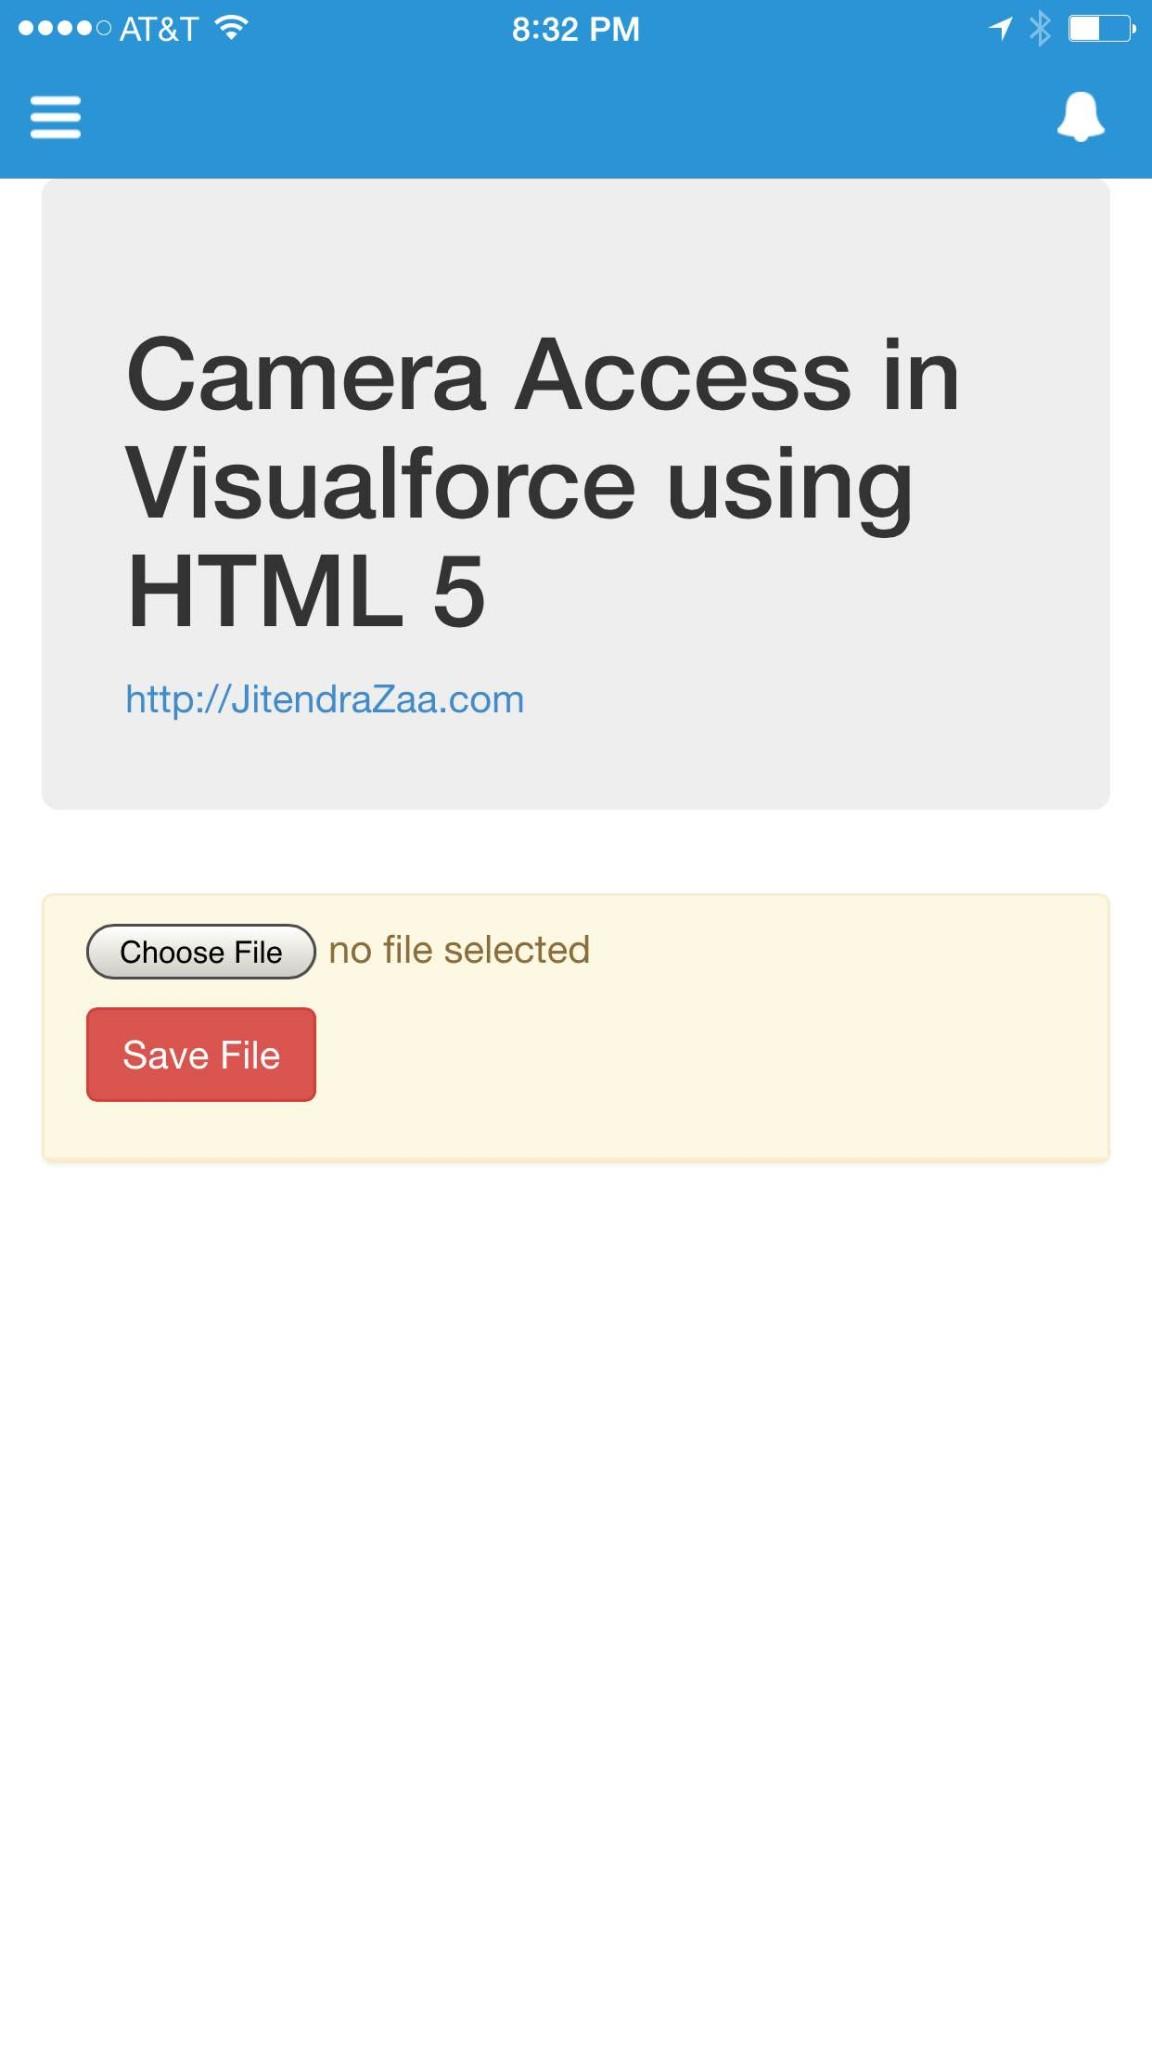 Salesforce 1 – Jitendra Zaa's Blog